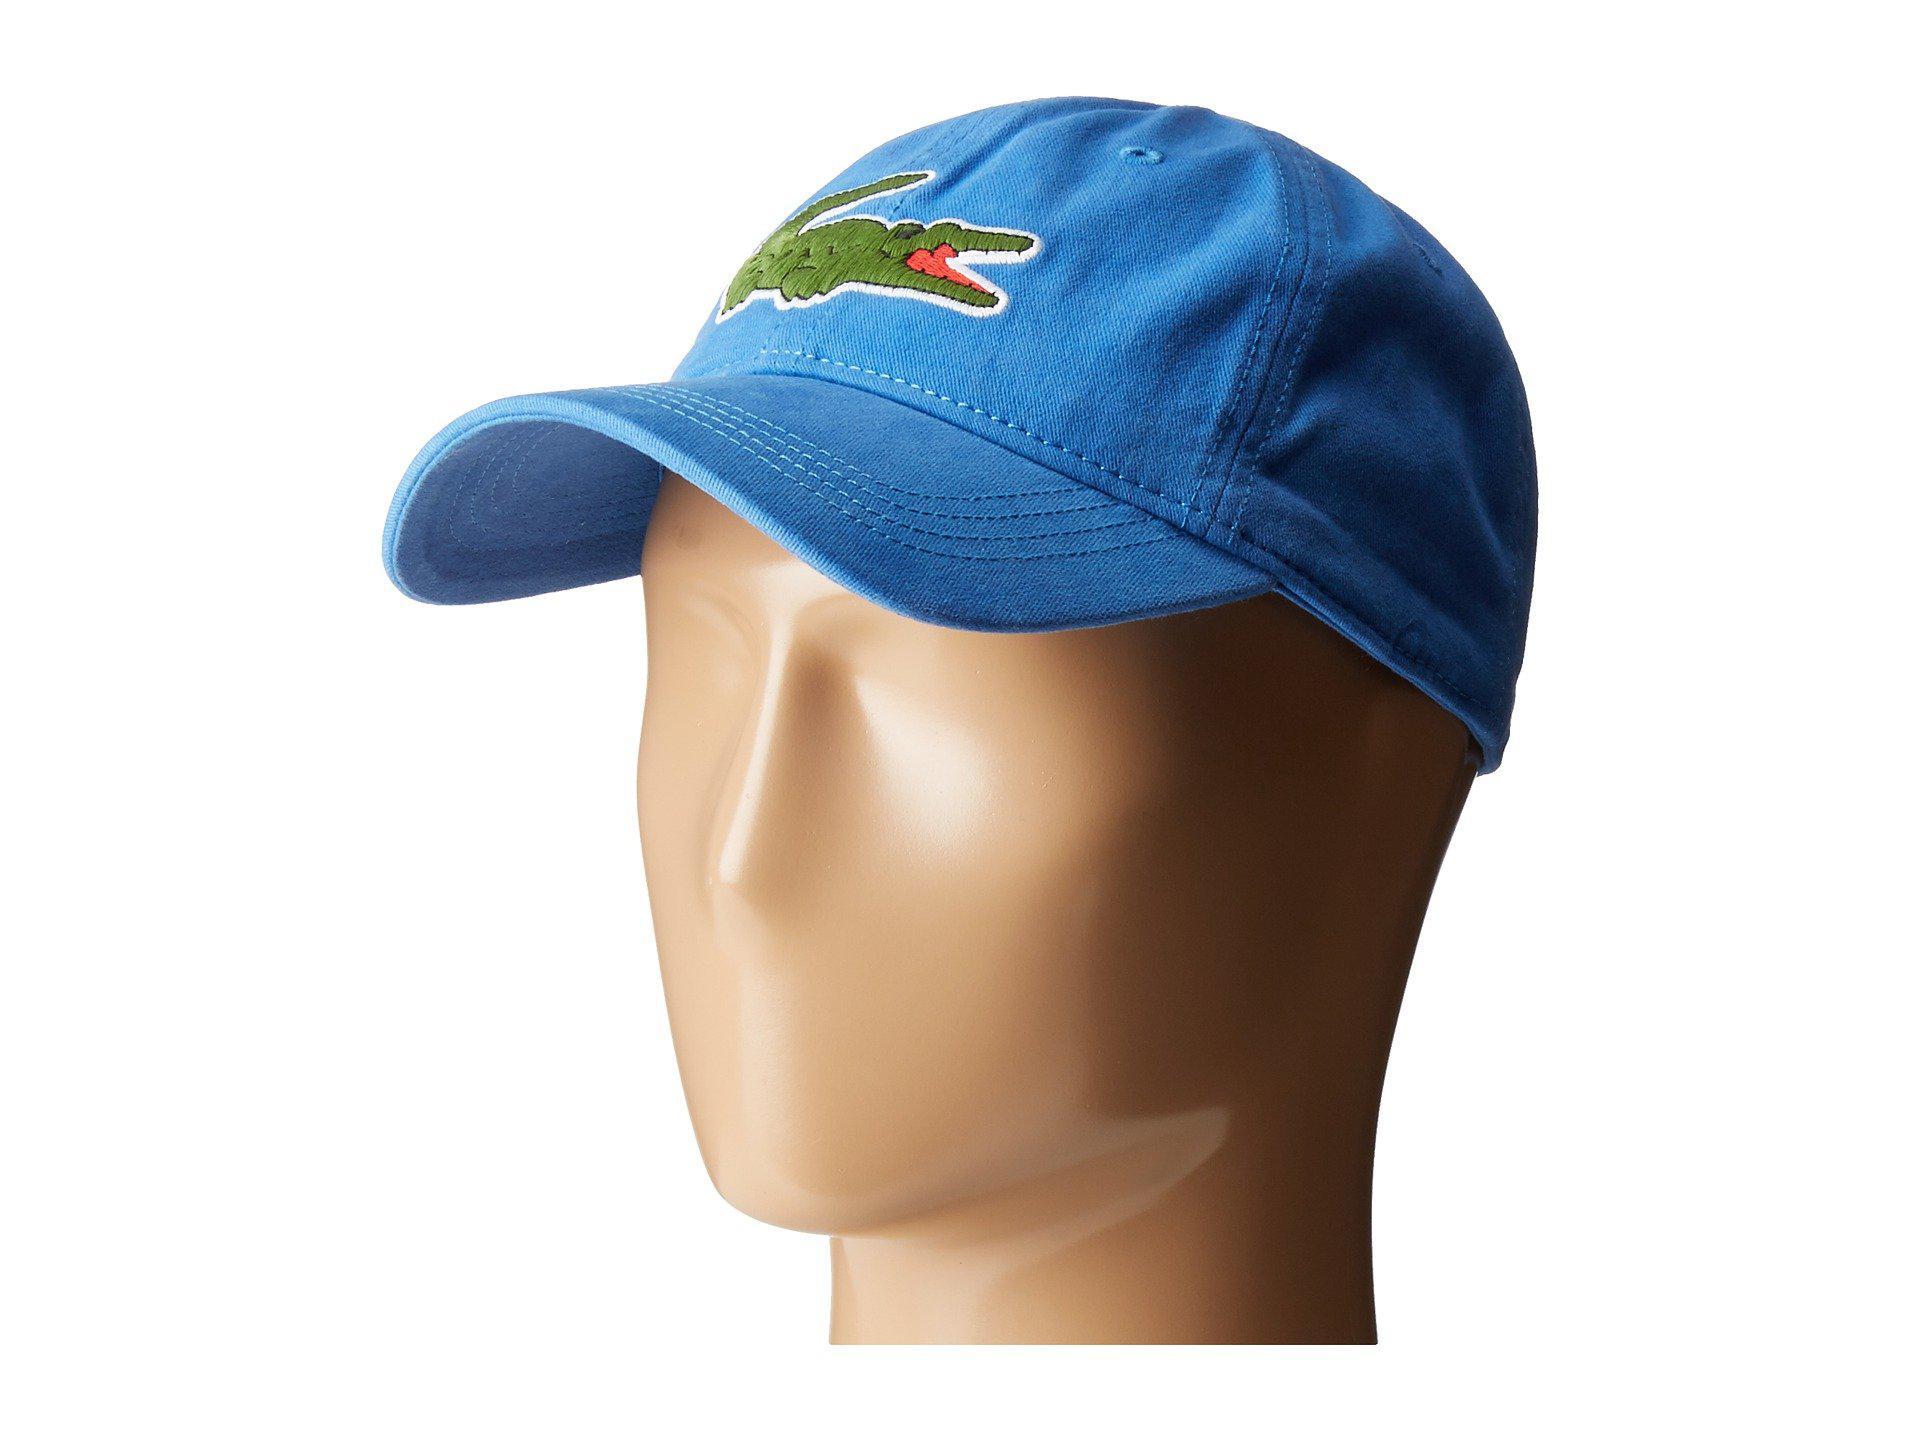 e14c09f703 Men's Blue Big Croc Gabardine Cap